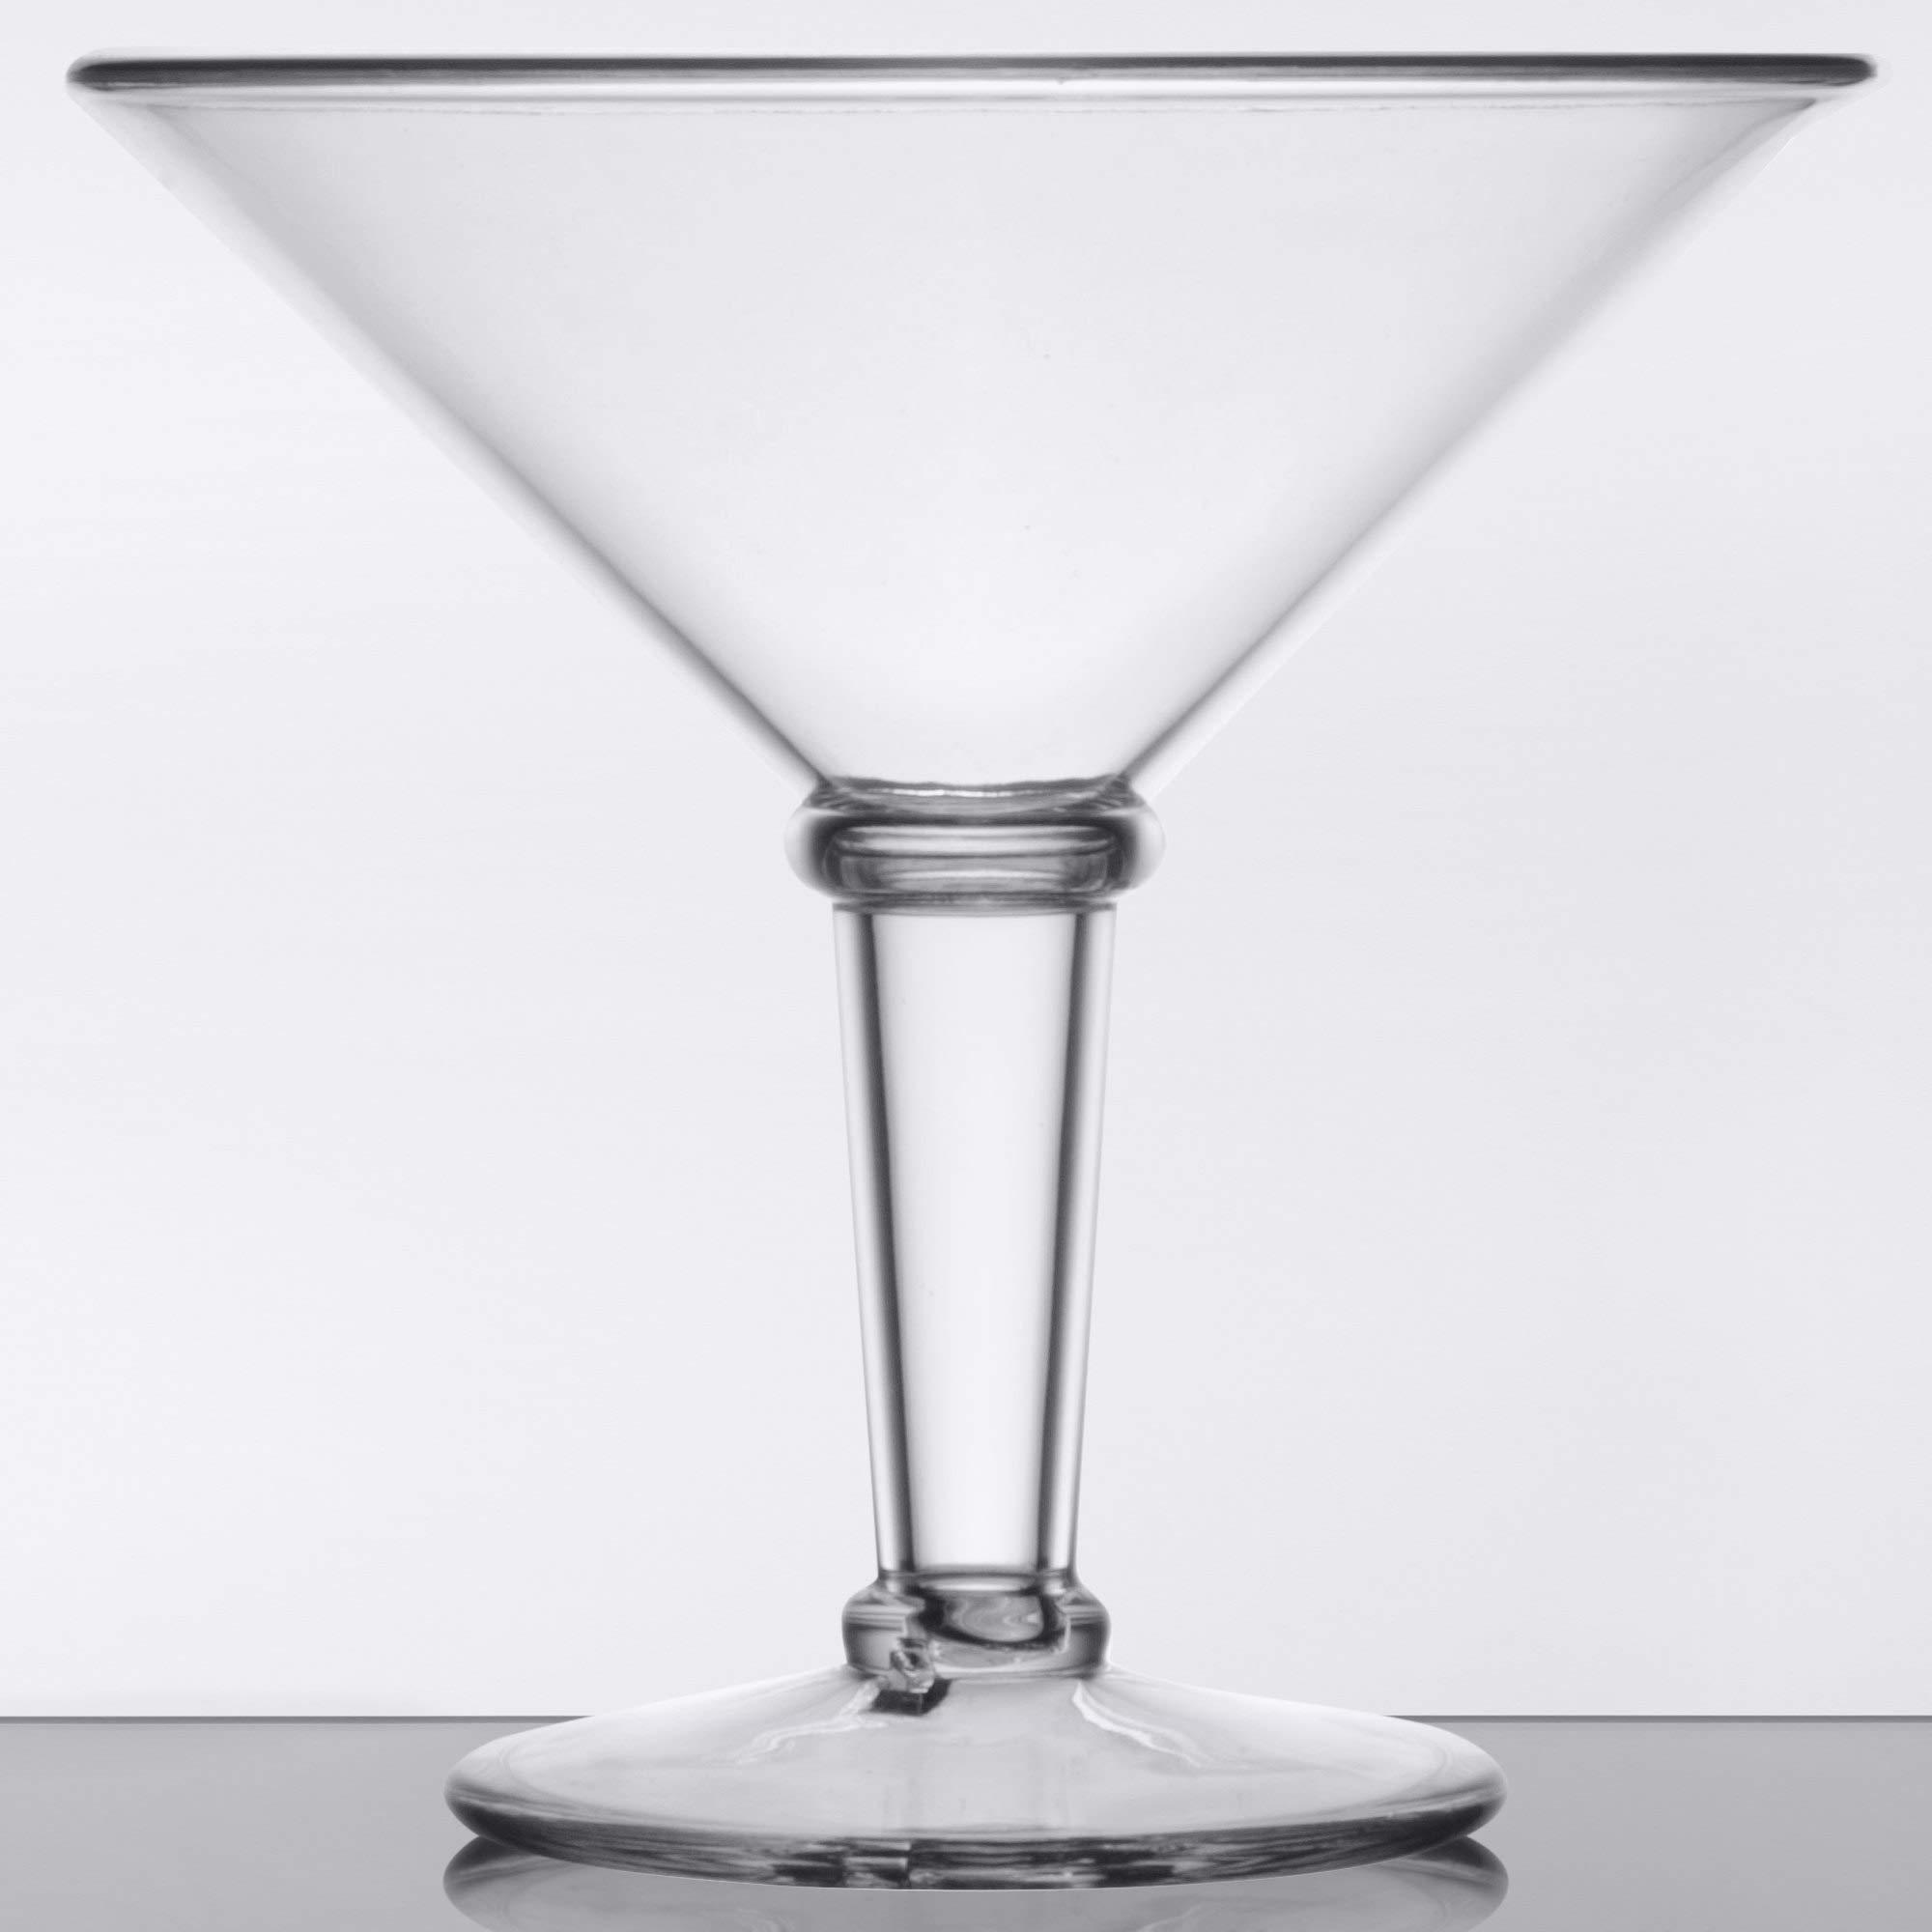 GET SW-1419-1-SAN-CL Plastic Super Martini Glasses, 48 Oz, Case of 3